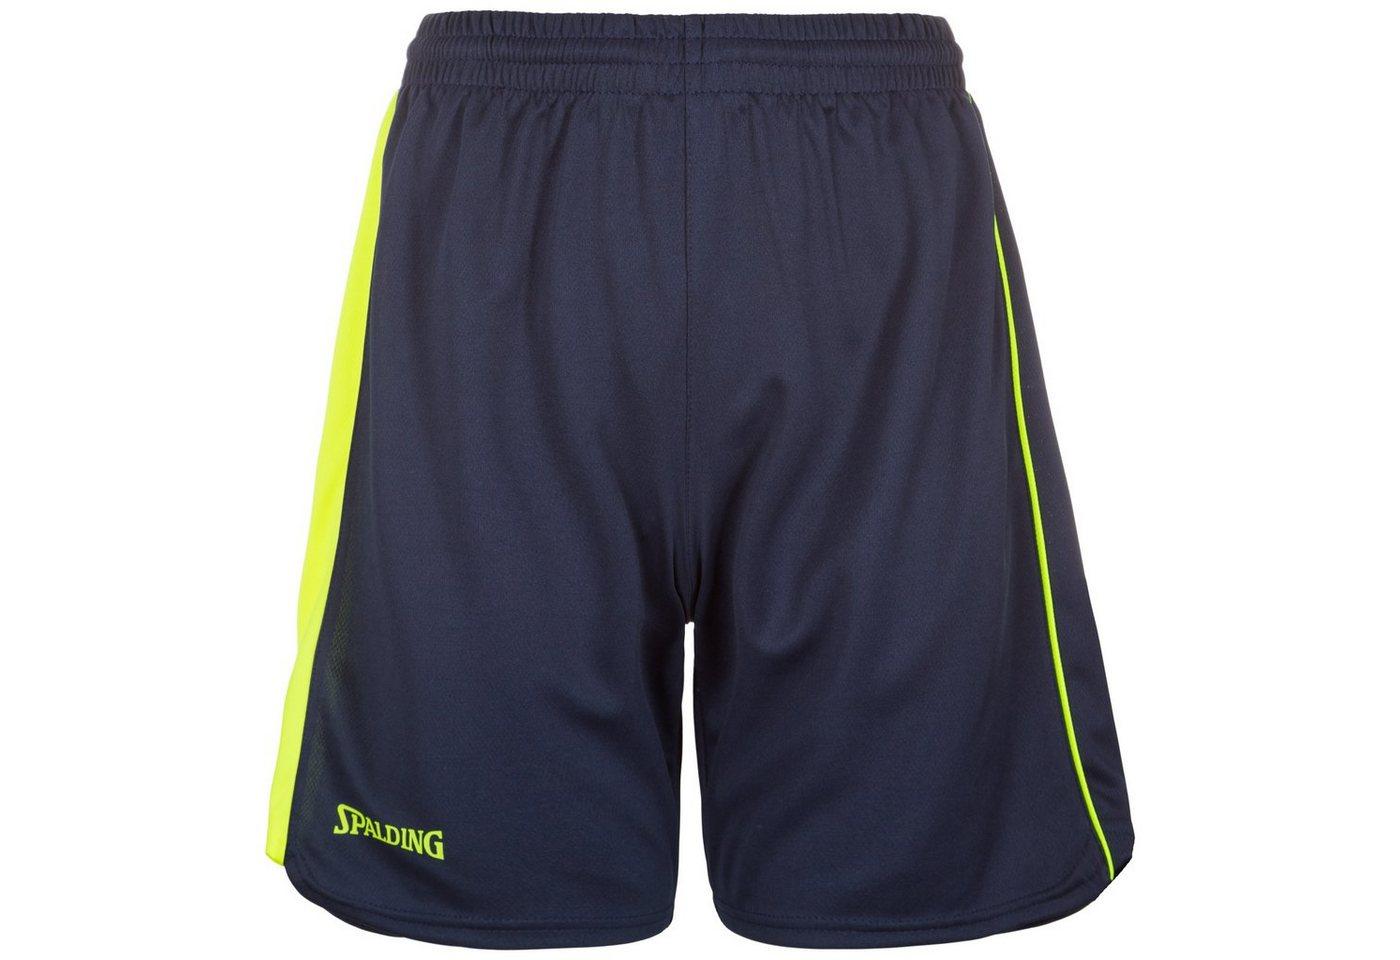 Spalding 4her II Basketballshort Damen | Sportbekleidung > Sporthosen > Basketballshorts | Blau | Spalding